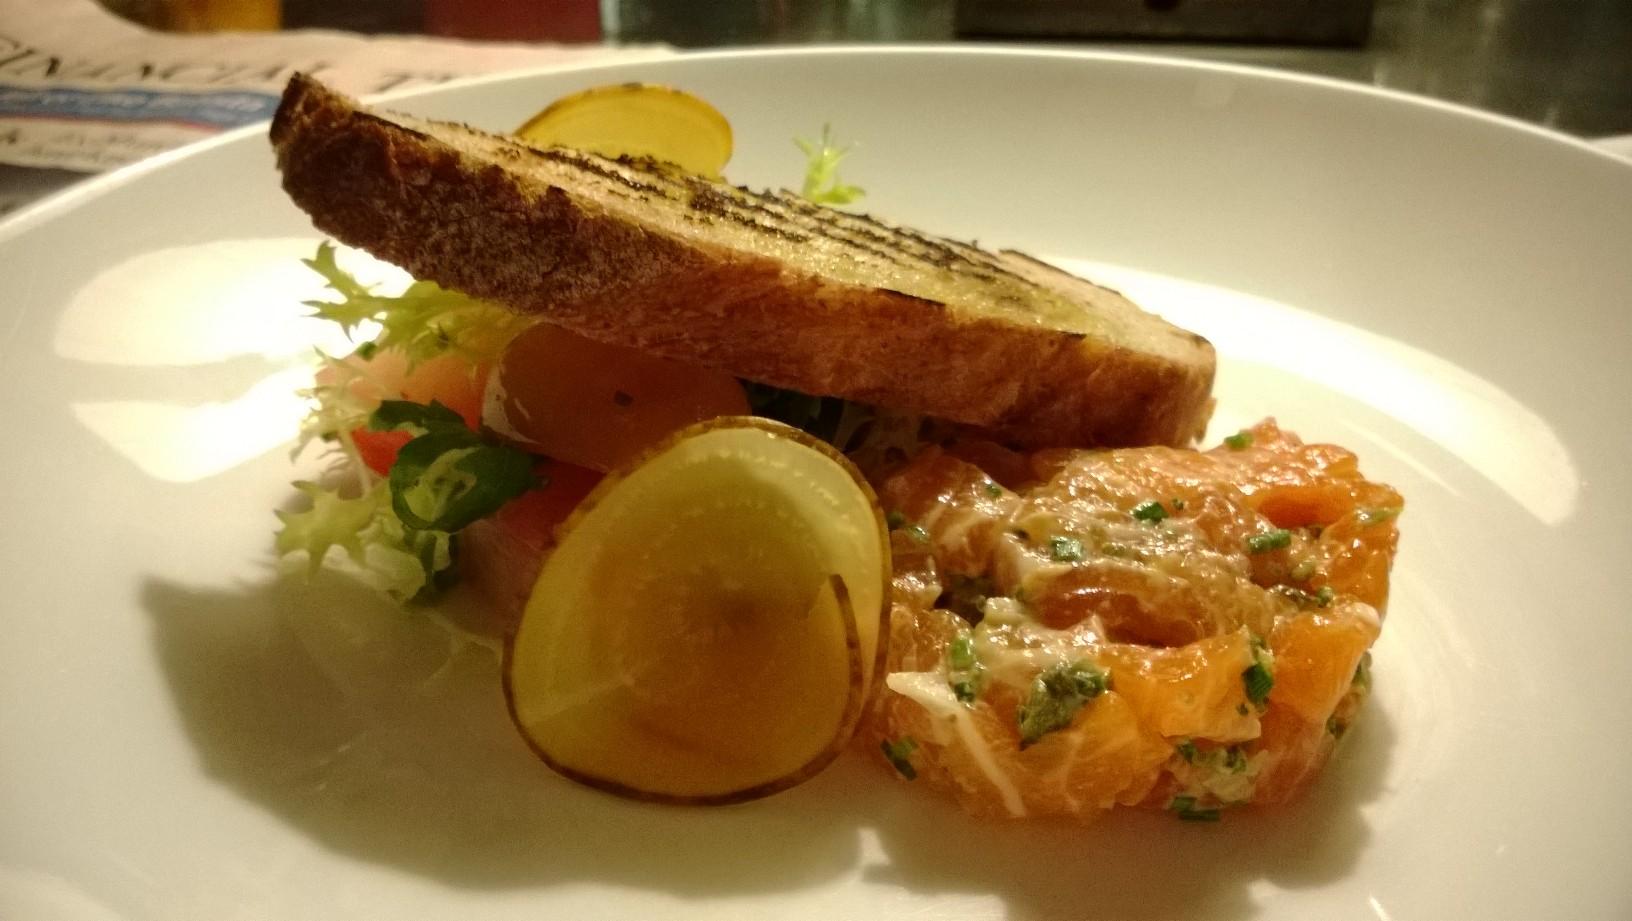 Best of British: Celebrating local ingredients at London's top restaurants